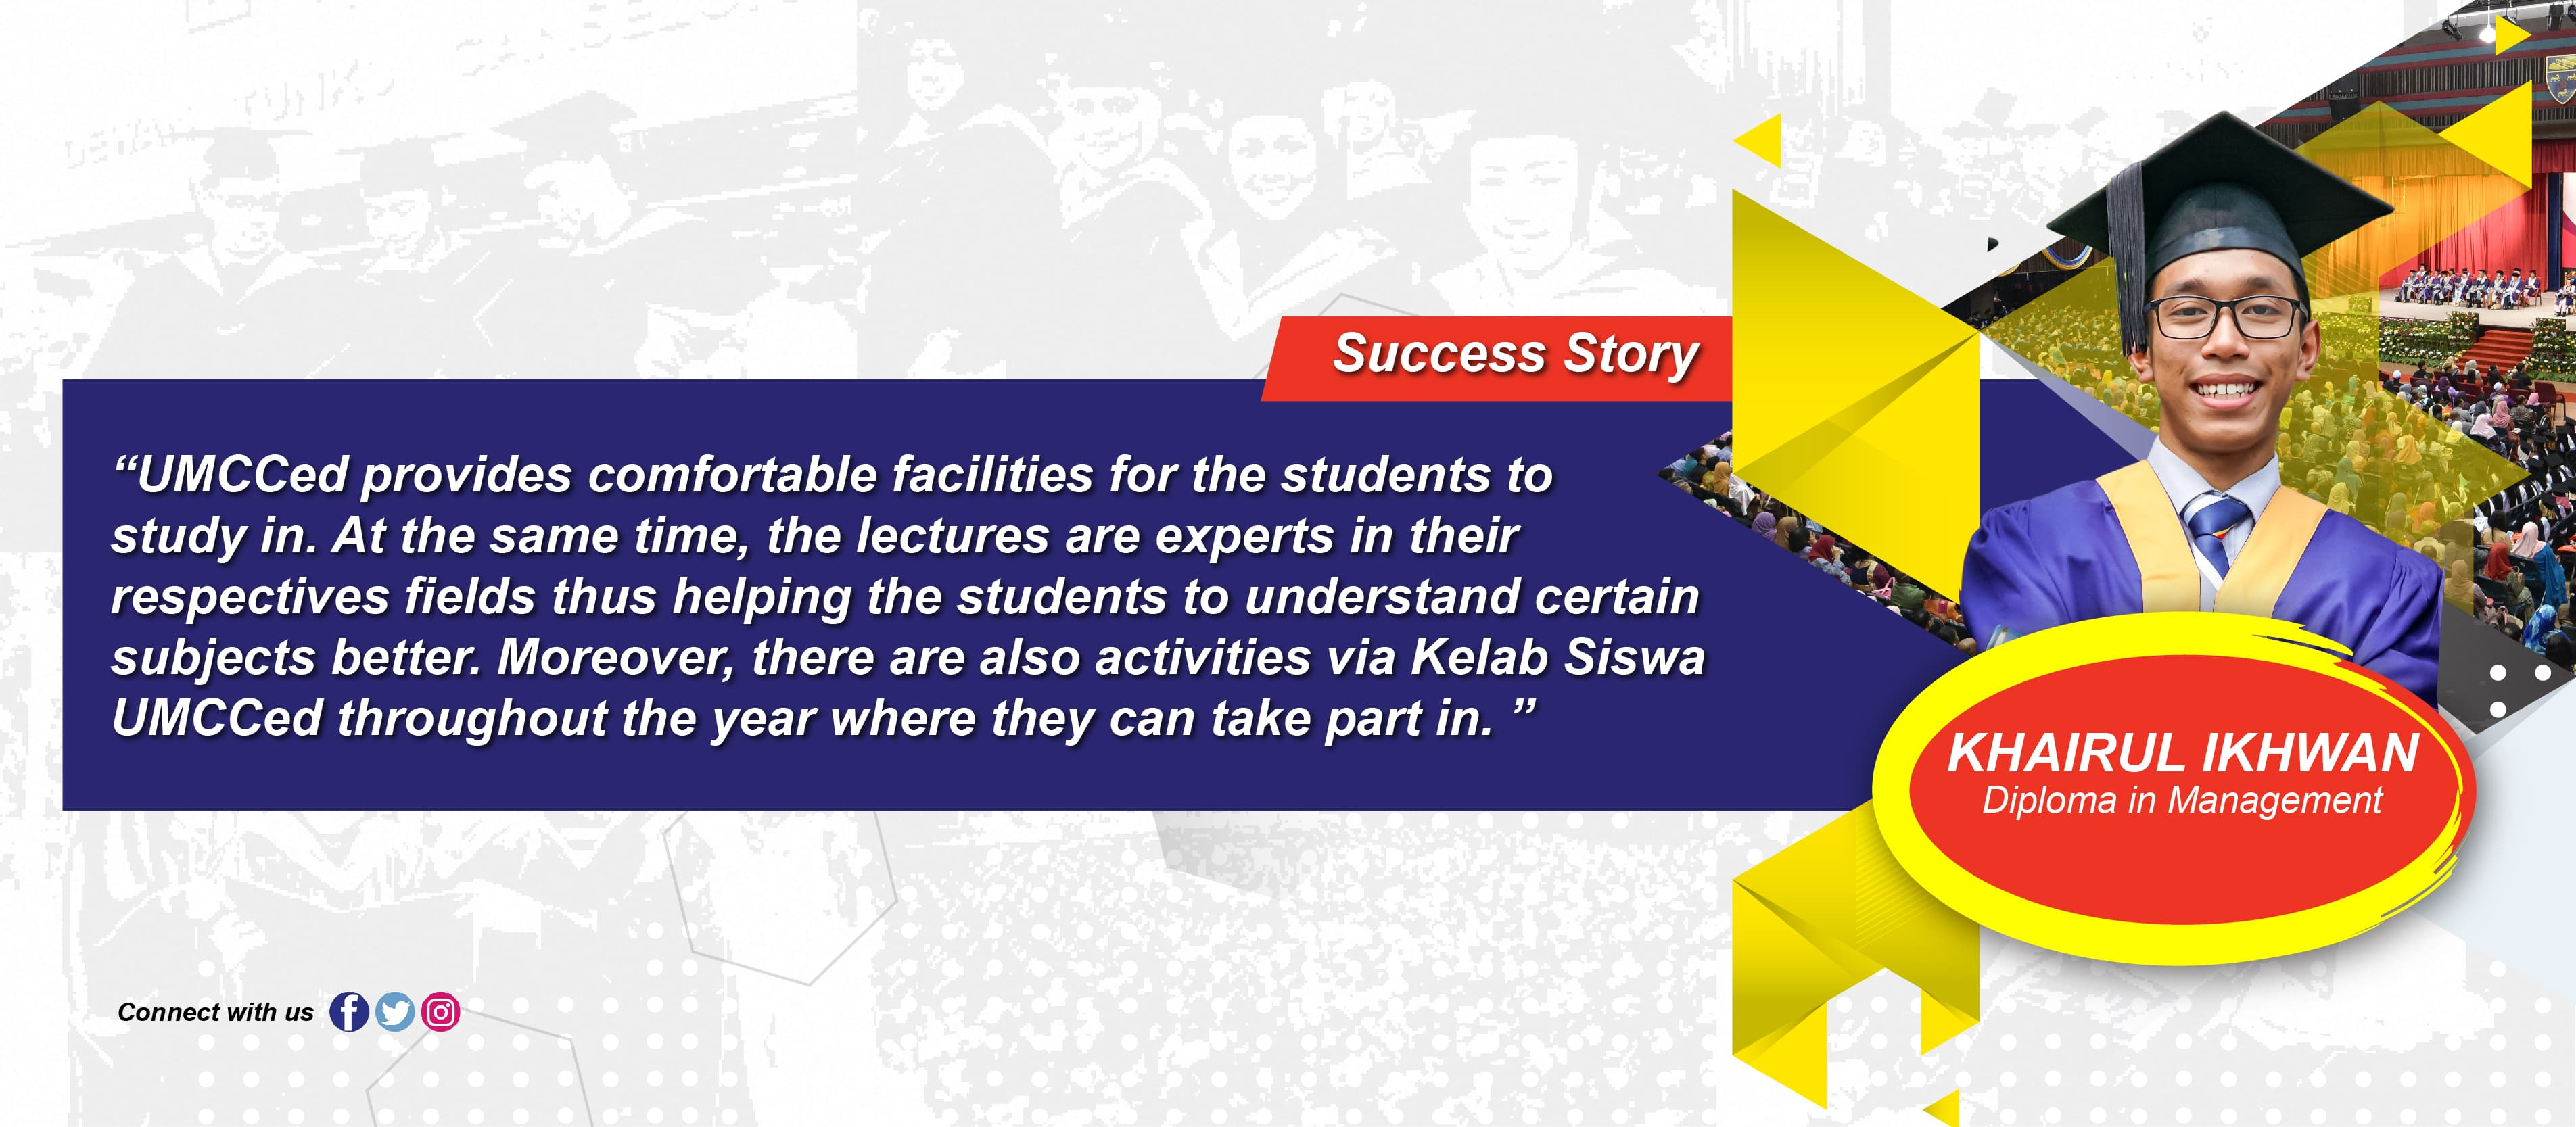 Banner_Website_Testimoni_Diploma_Khairul_Ikhwan-01